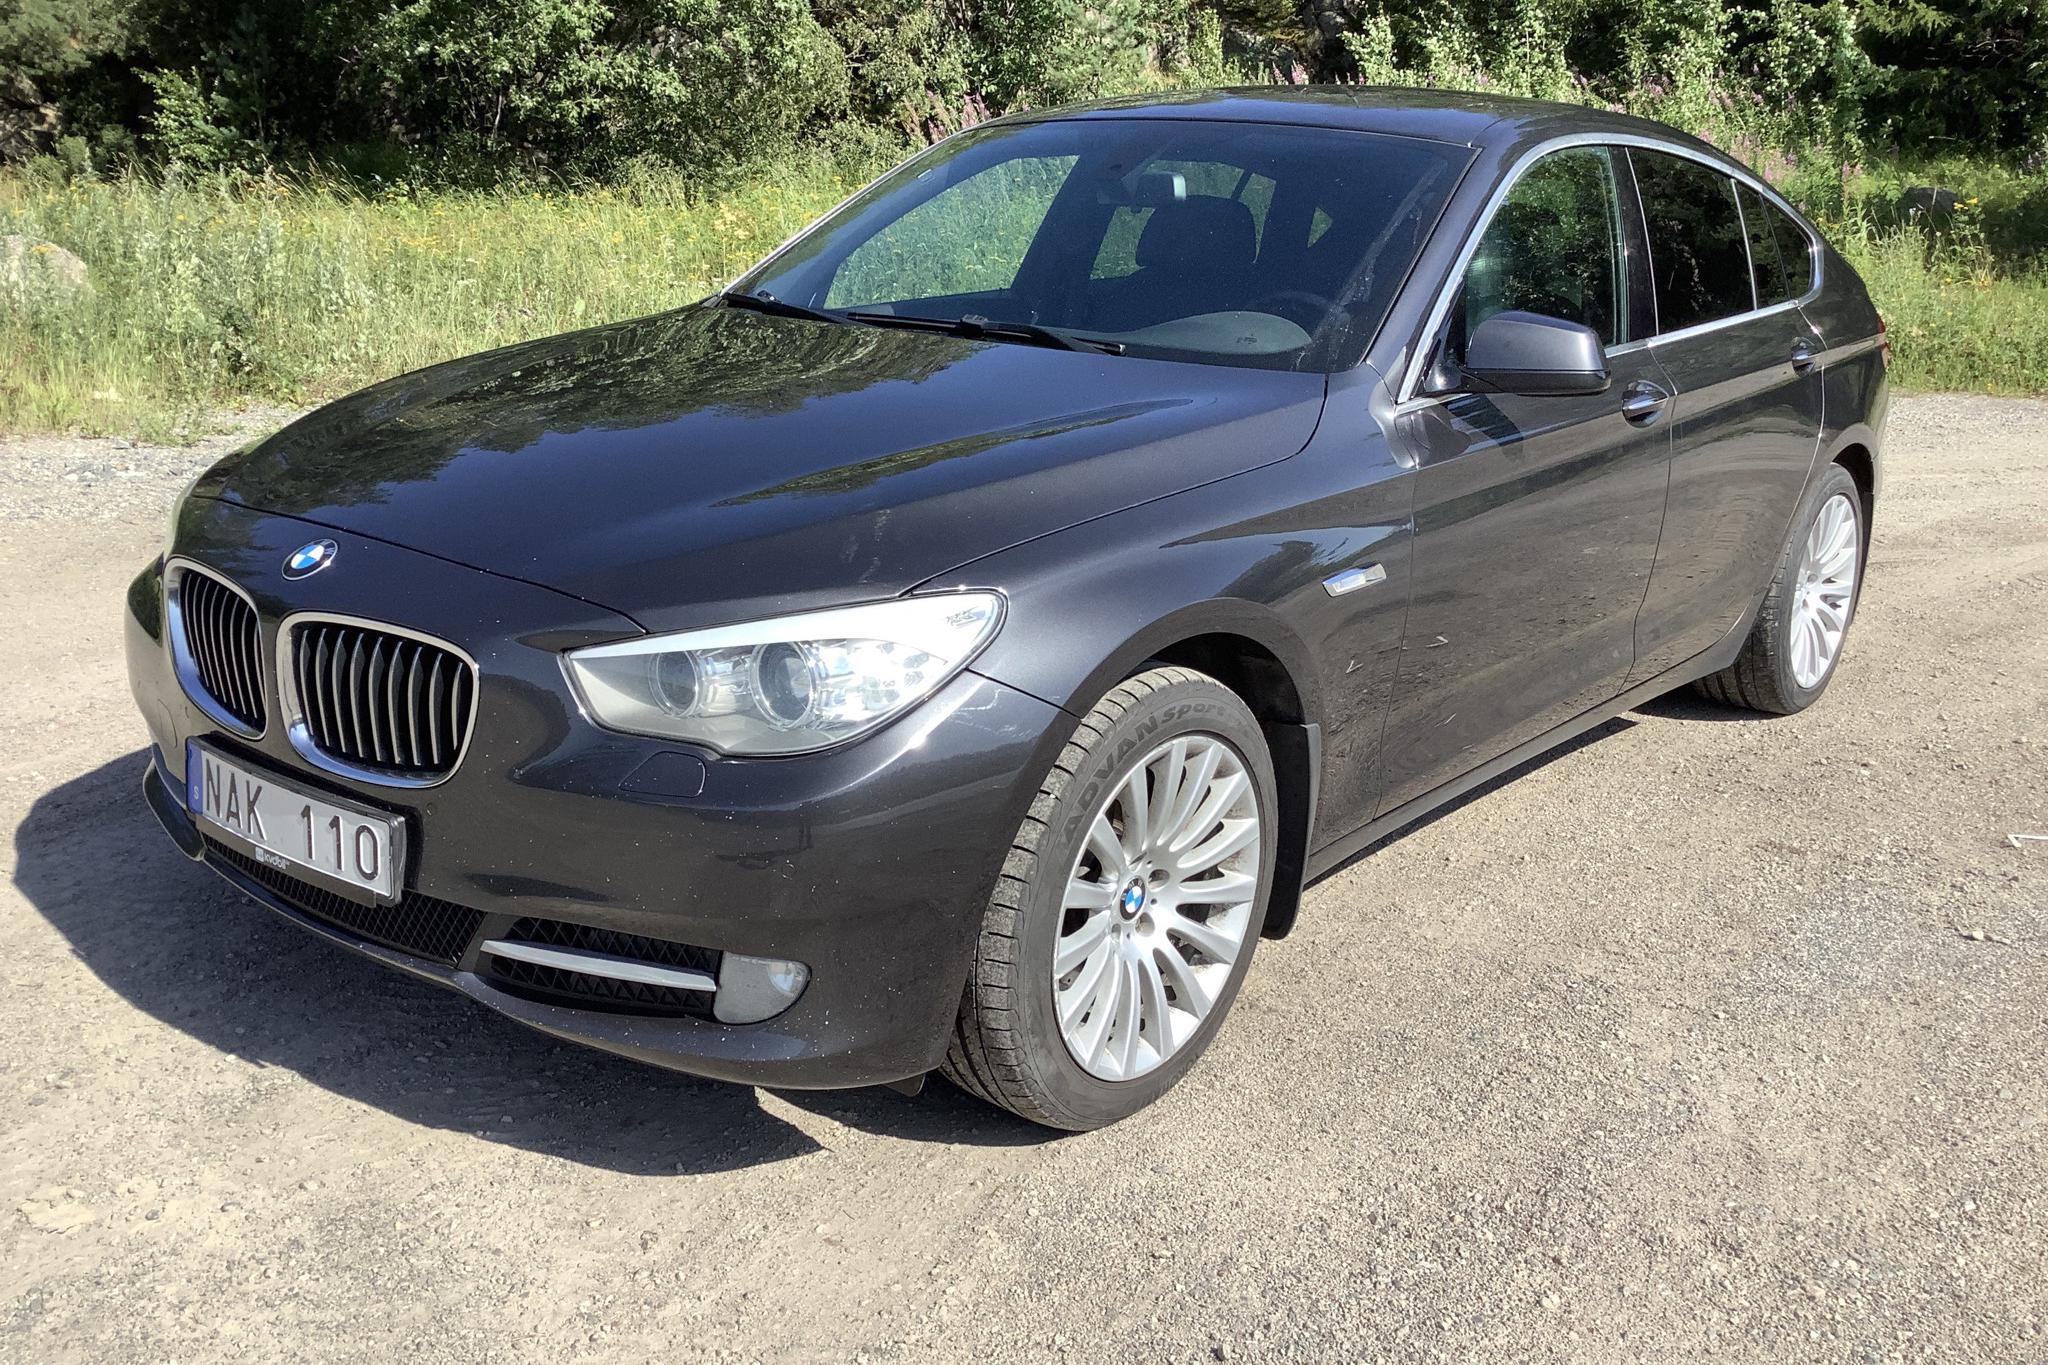 BMW 530d GT xDrive, F07  (258hk) - 200 290 km - Automatic - gray - 2013